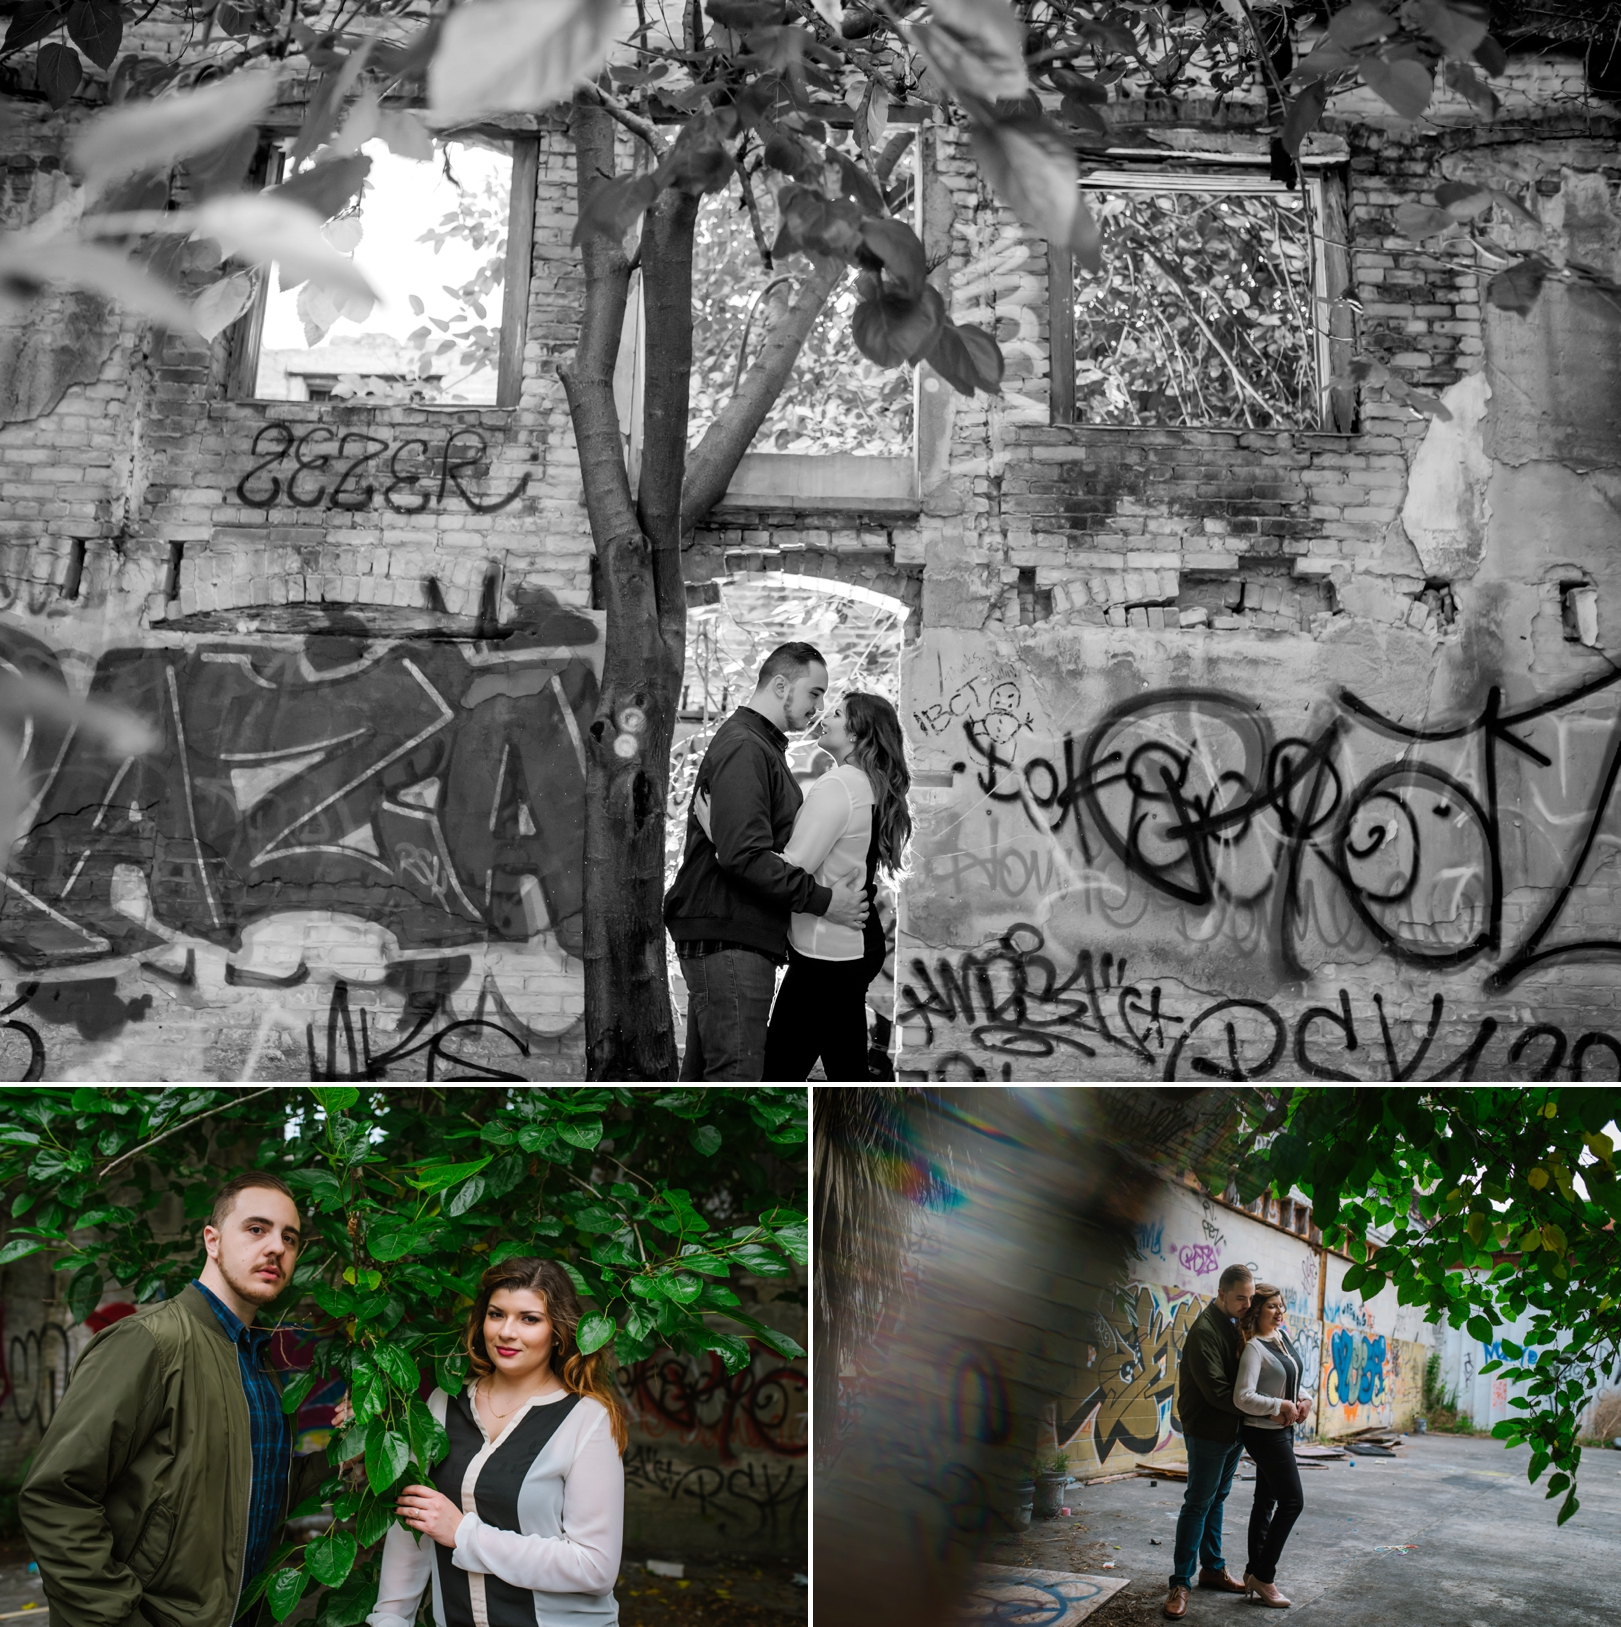 ashlee-hamon-wedding-photography-tampa-urban-cafe-engagement_0005.jpg